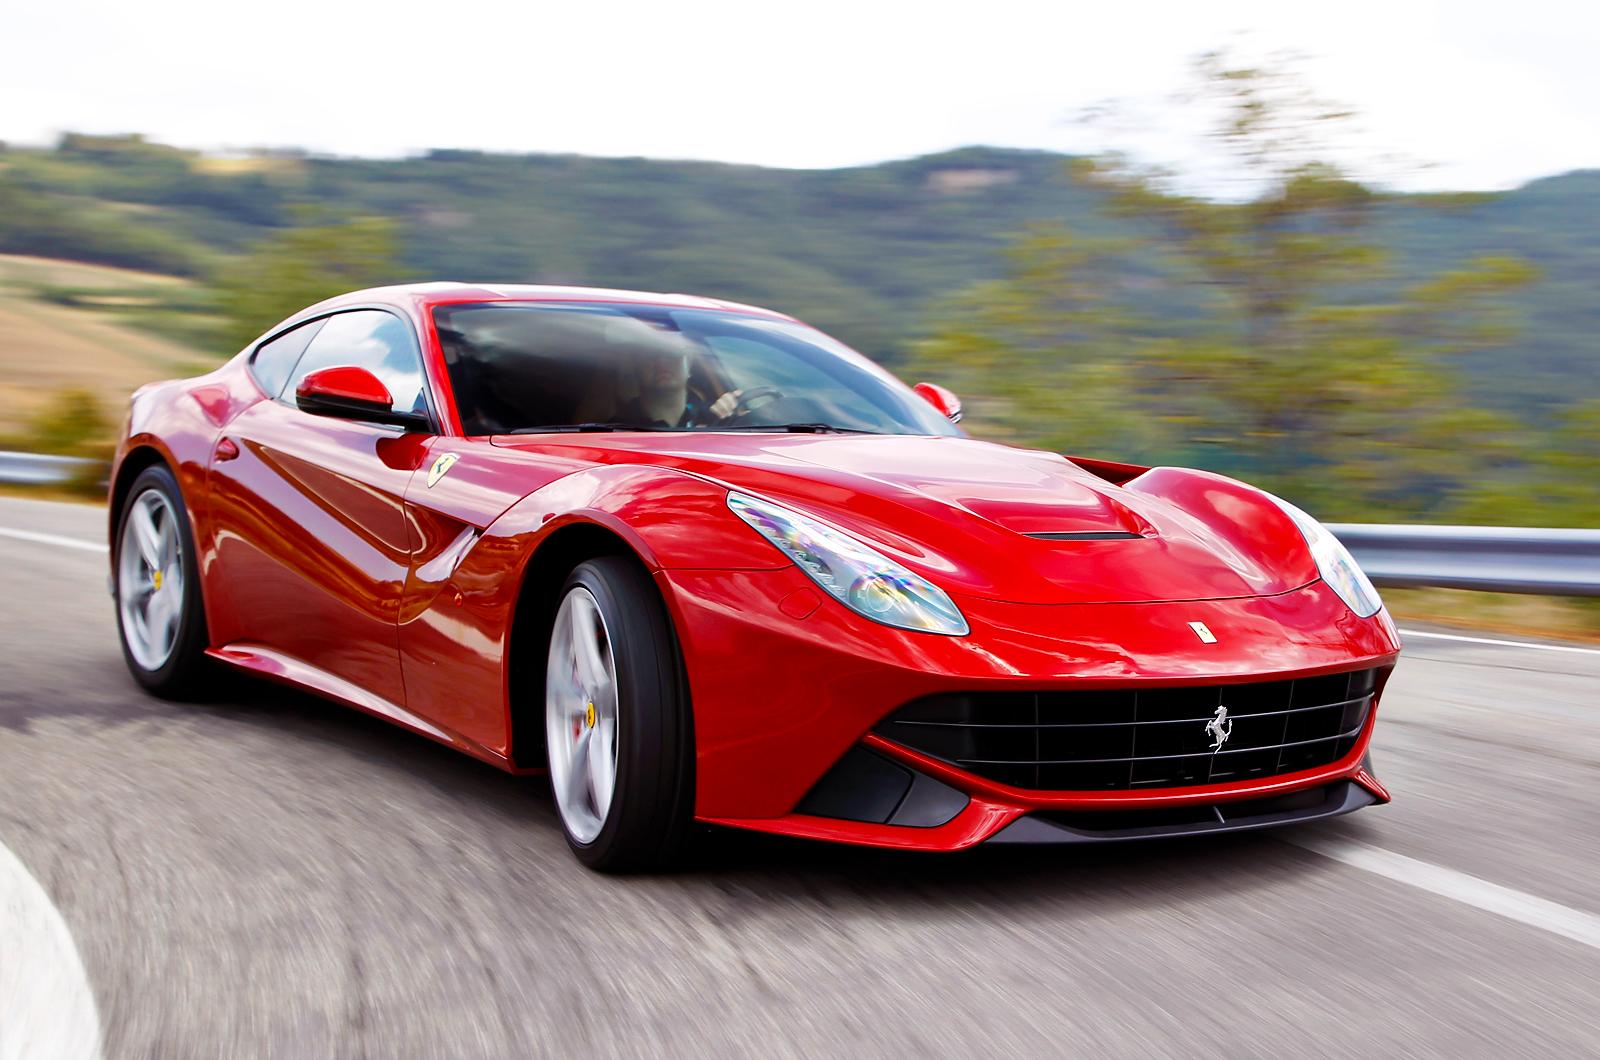 Ferrari Cars 30 Car Desktop Wallpaper